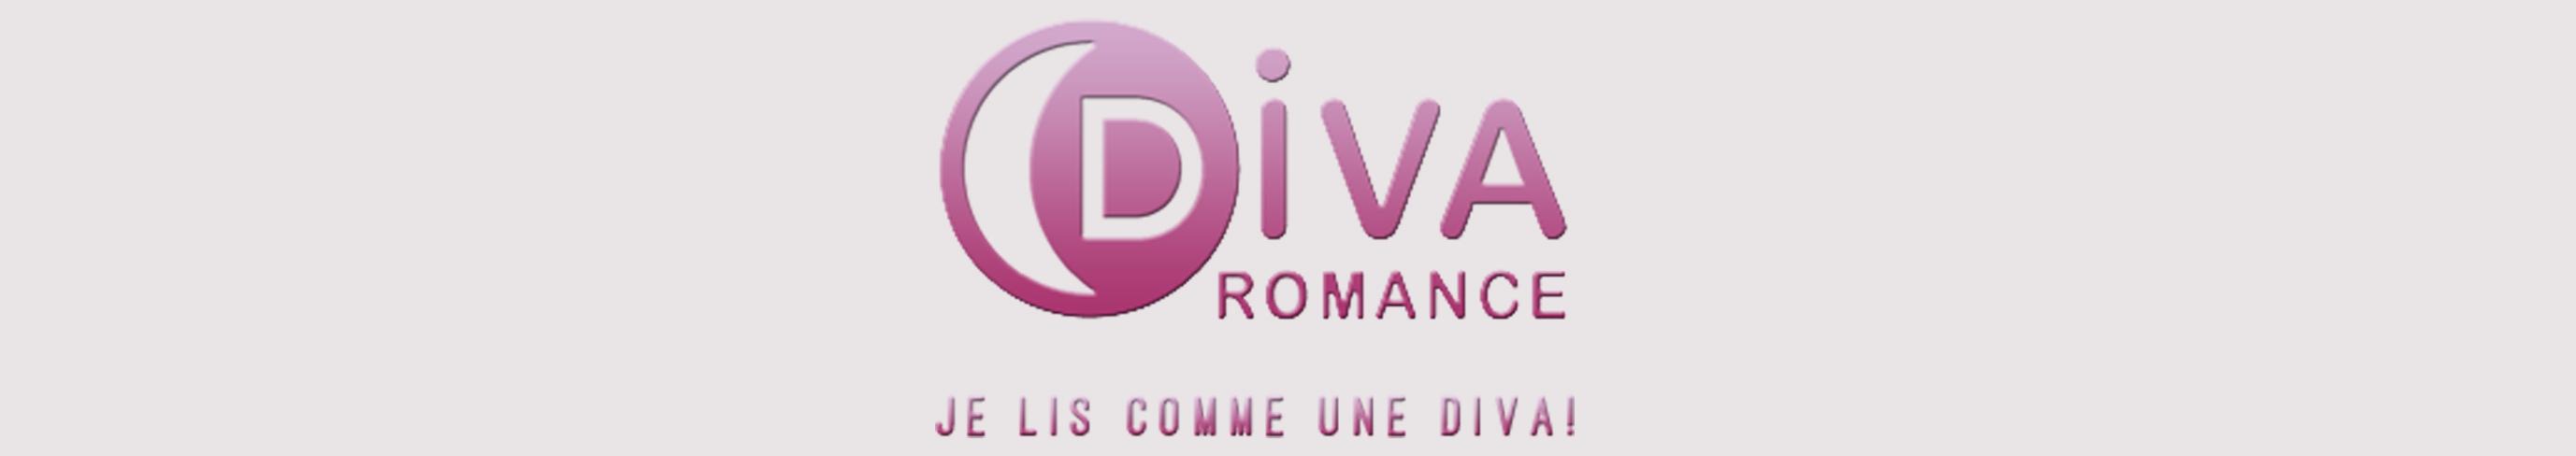 diva-romance-bandeau